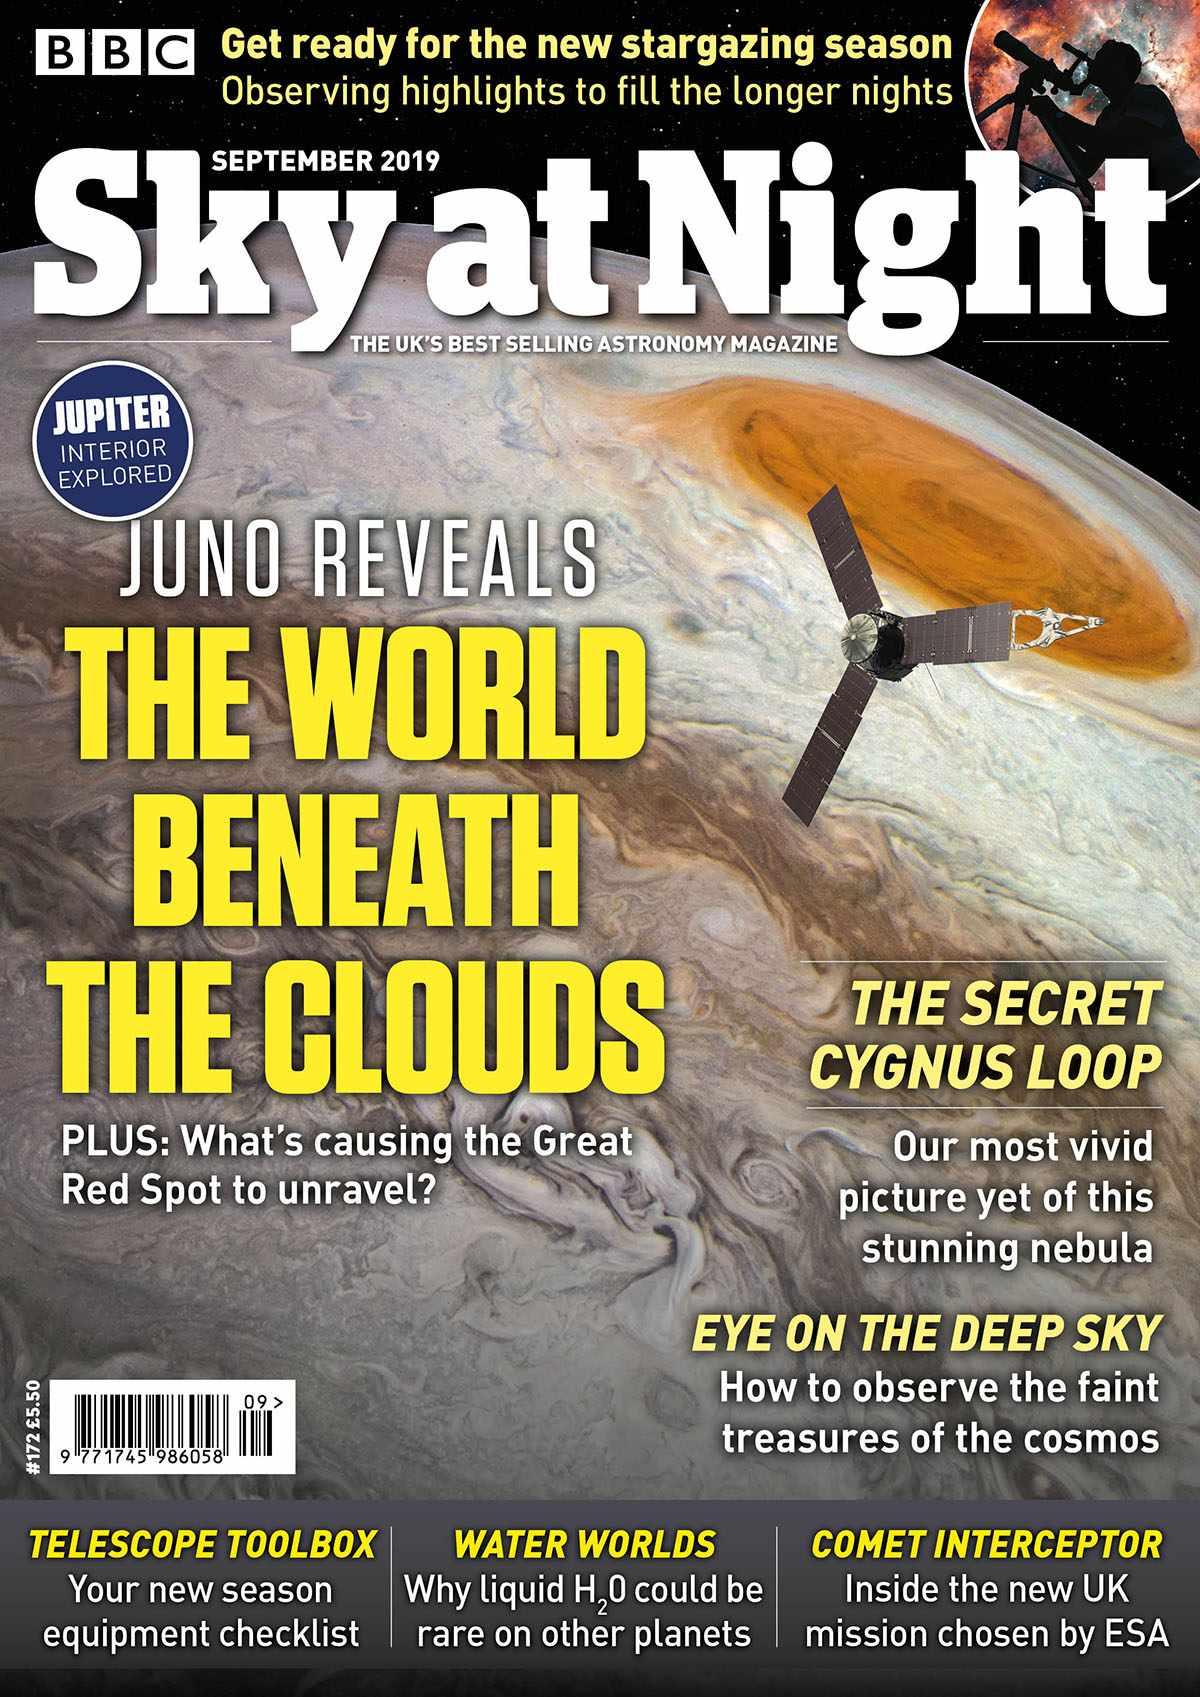 BBC Sky at Night Magazine September 2019 issue